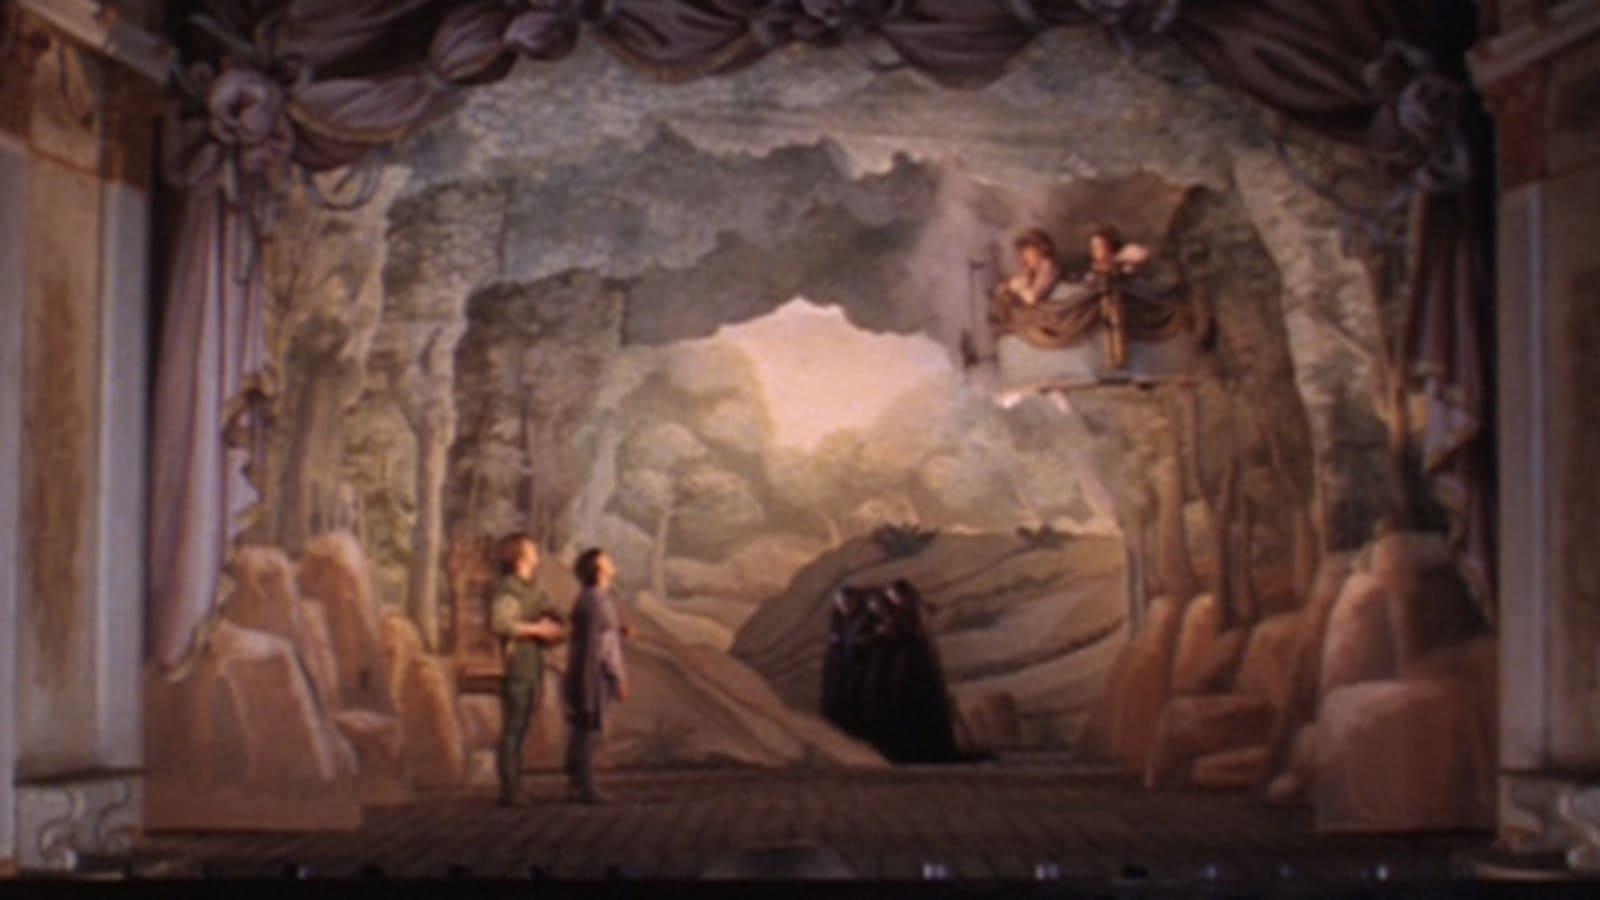 The Magic Flute backdrop